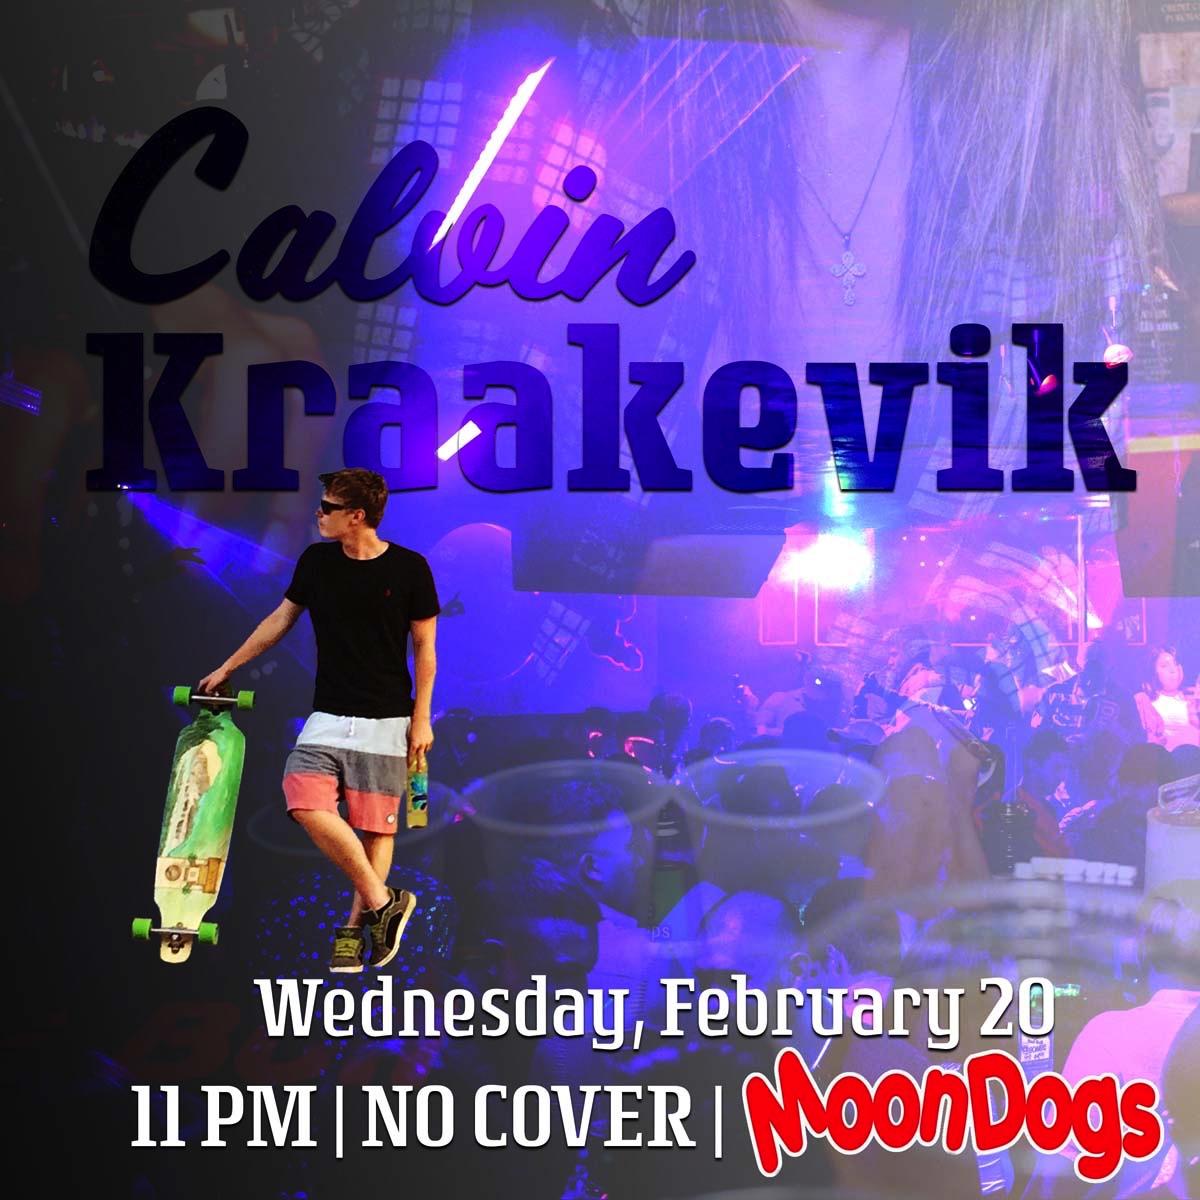 Calvin Kraakevik Moondogs Atlanta EDM Concerts Shows